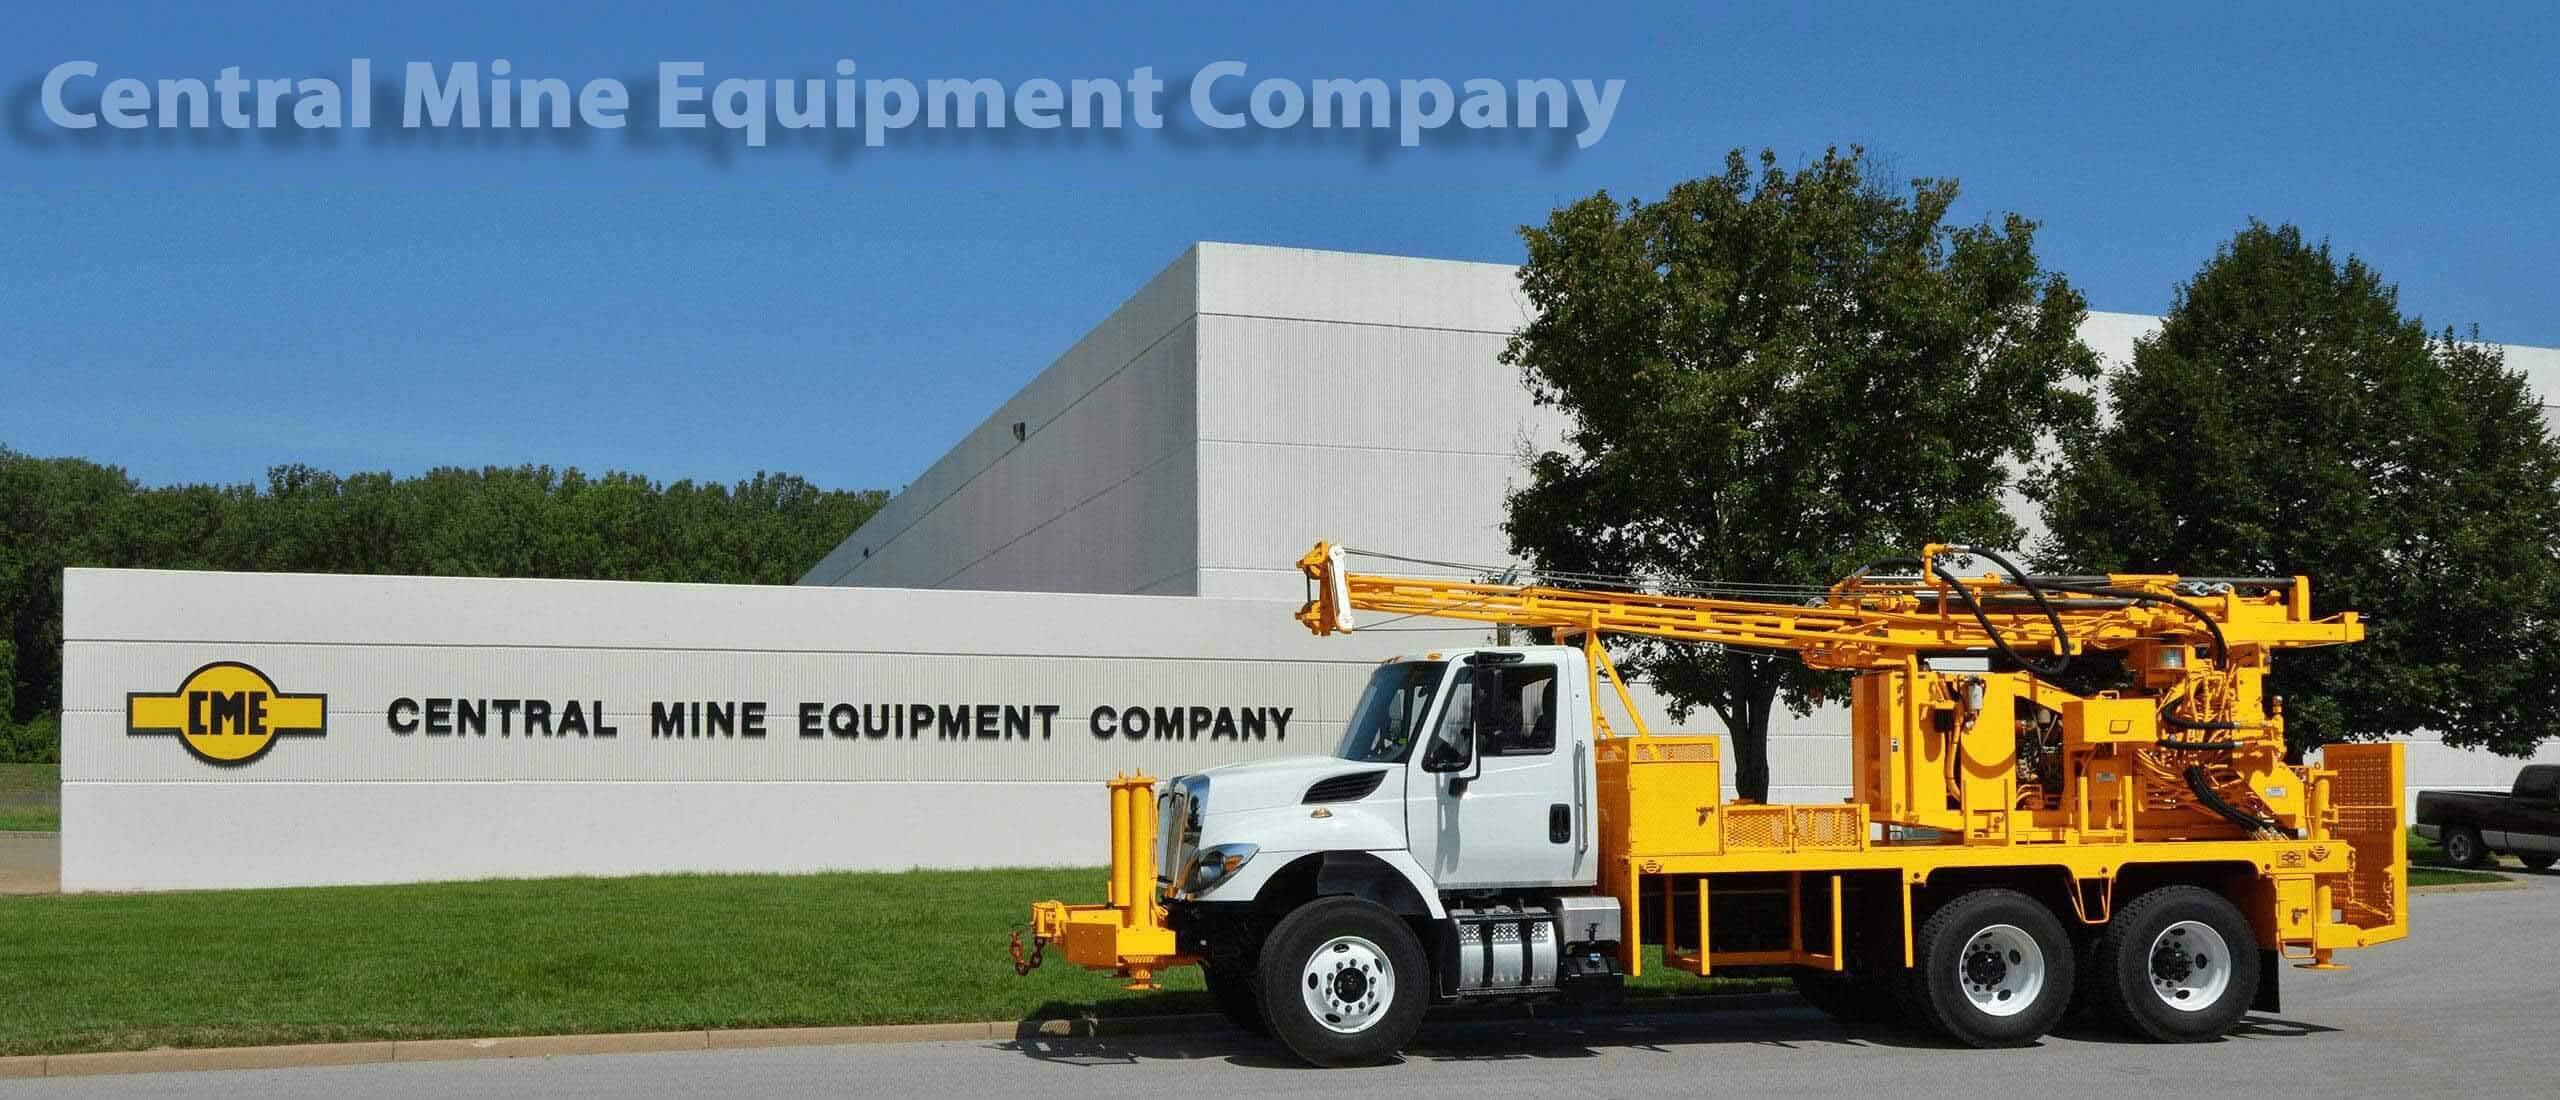 Central Mine Equipment Company Drilling Rigs